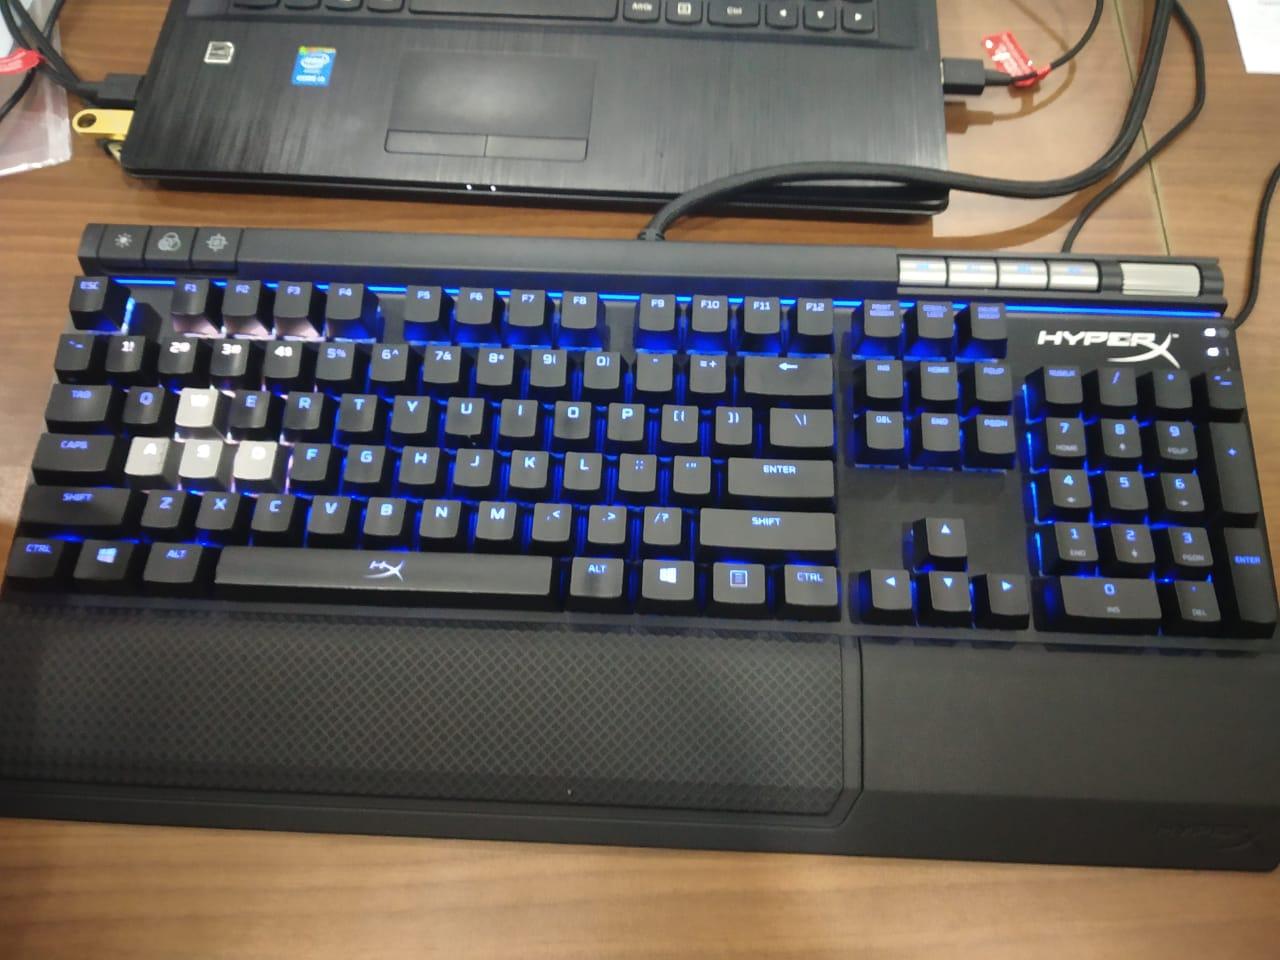 HyperX Alloy Core RGB Keyboard